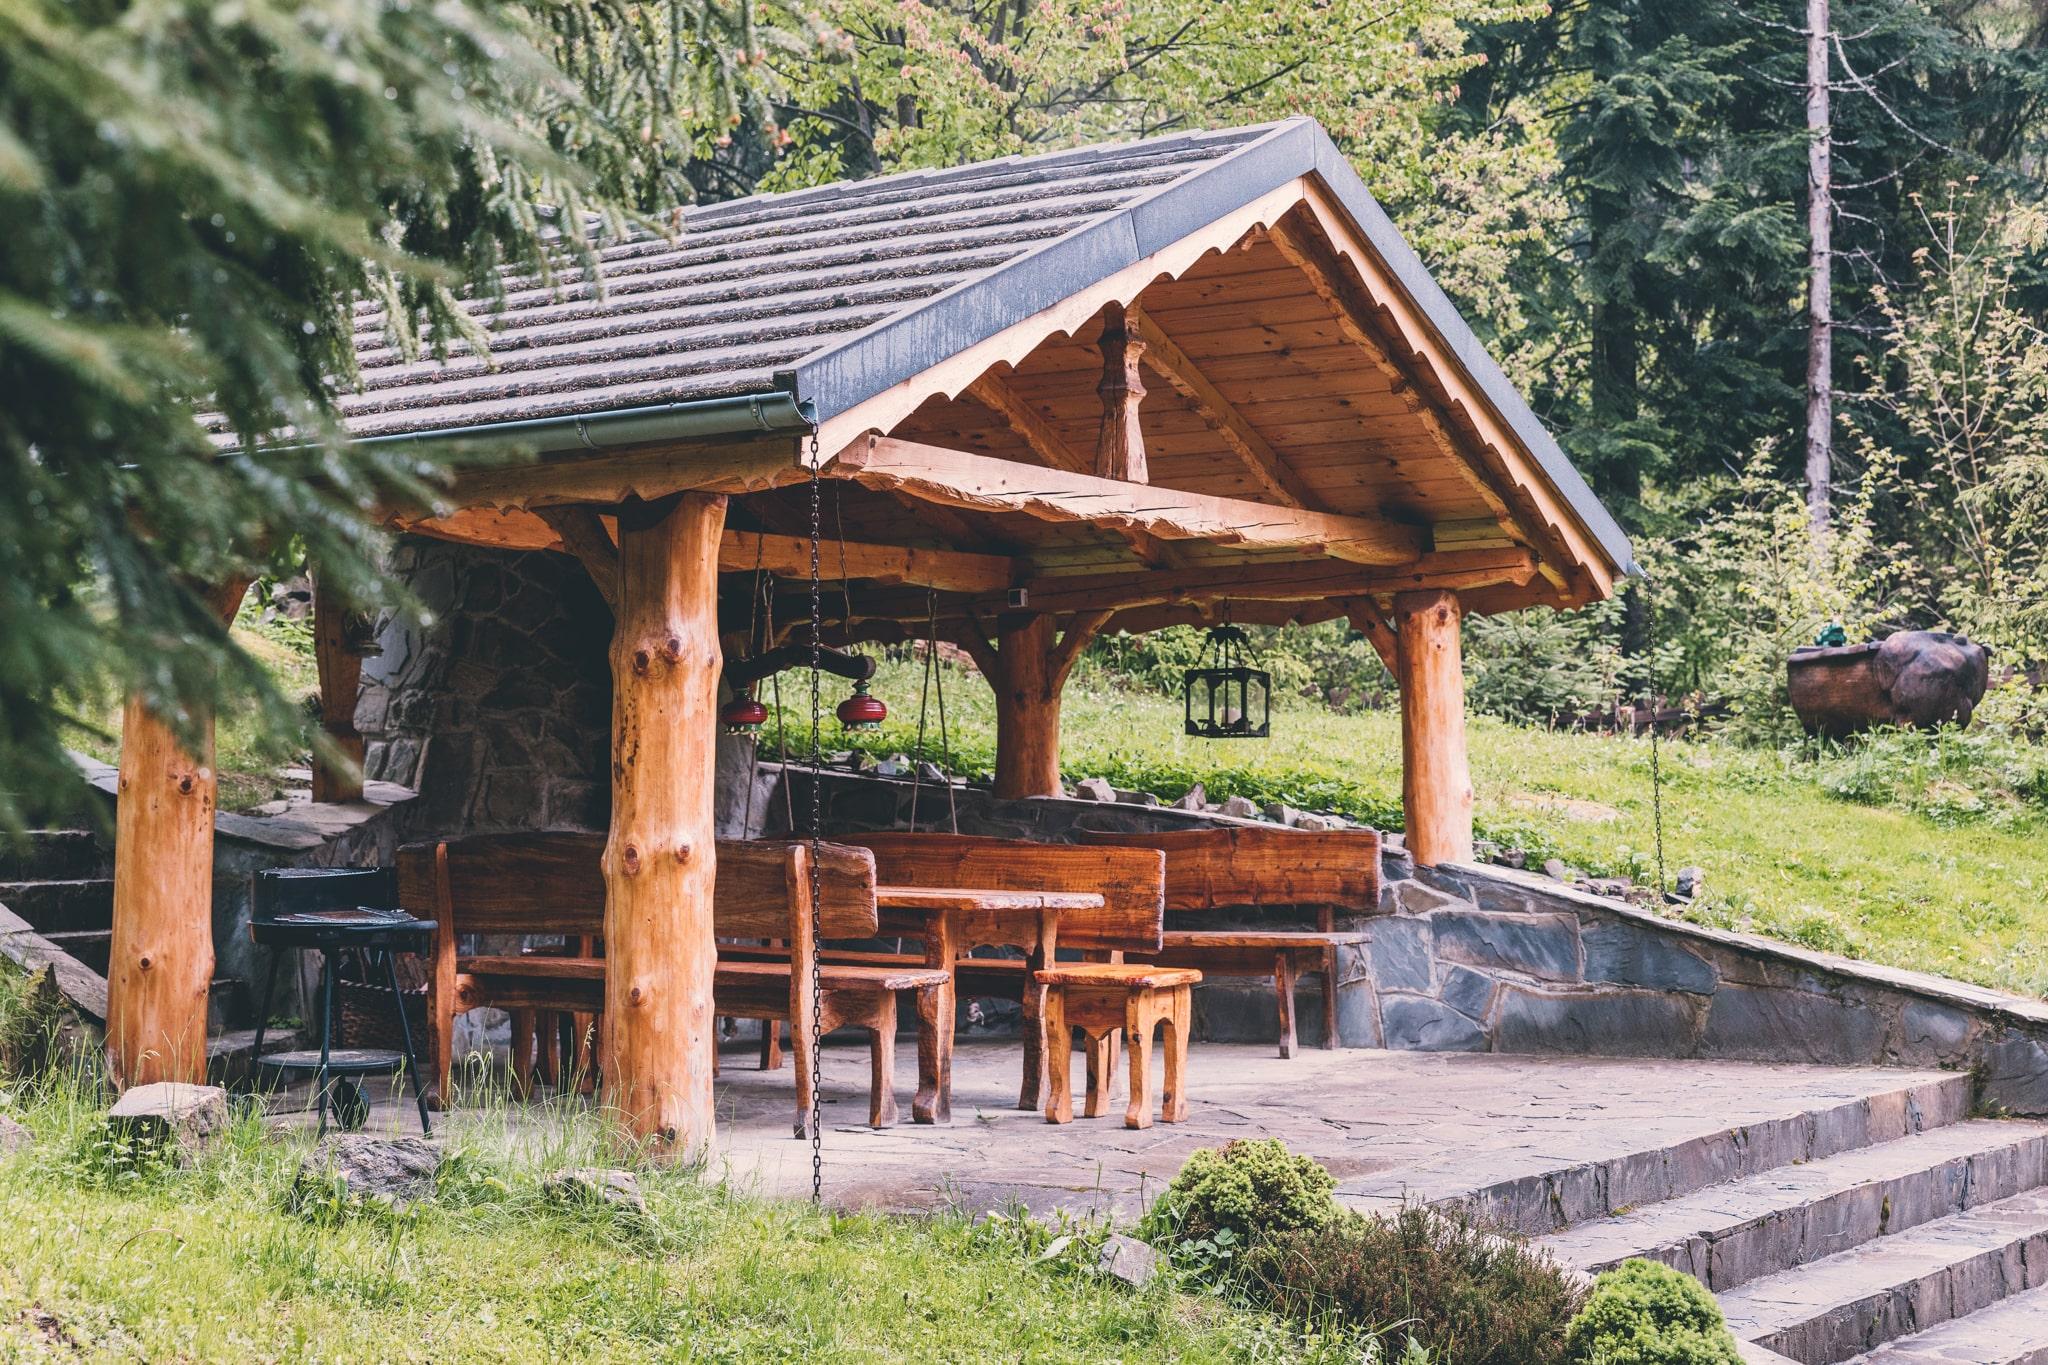 Domek w Rycerce - What will I eat?